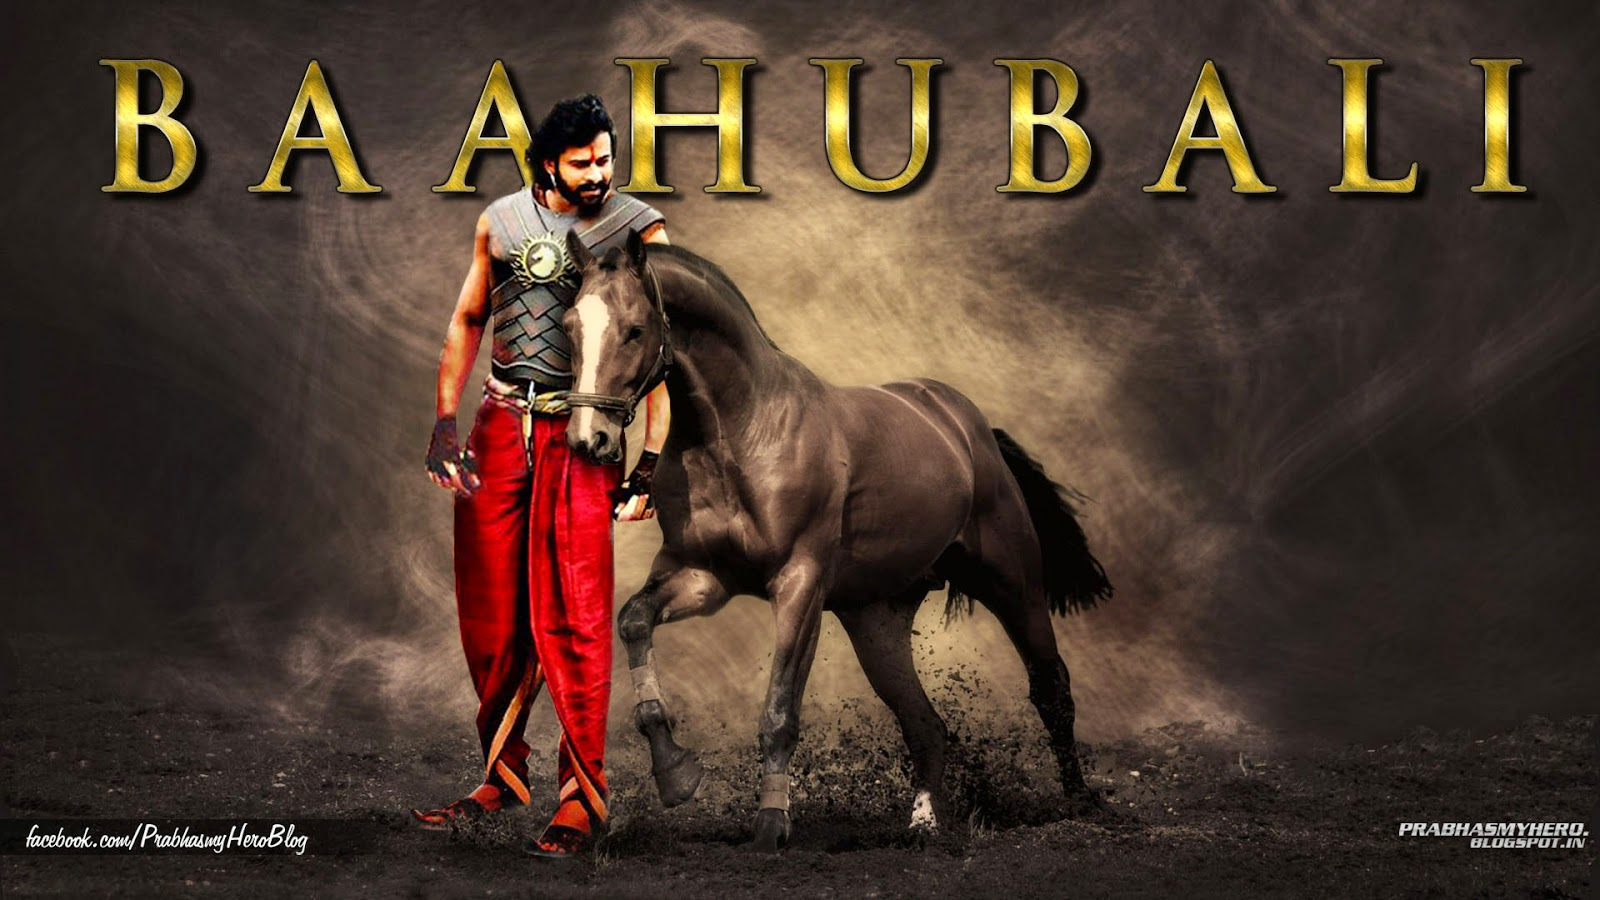 PrabhasMyHero Blog: Exclusive Baahubali Wallpapers